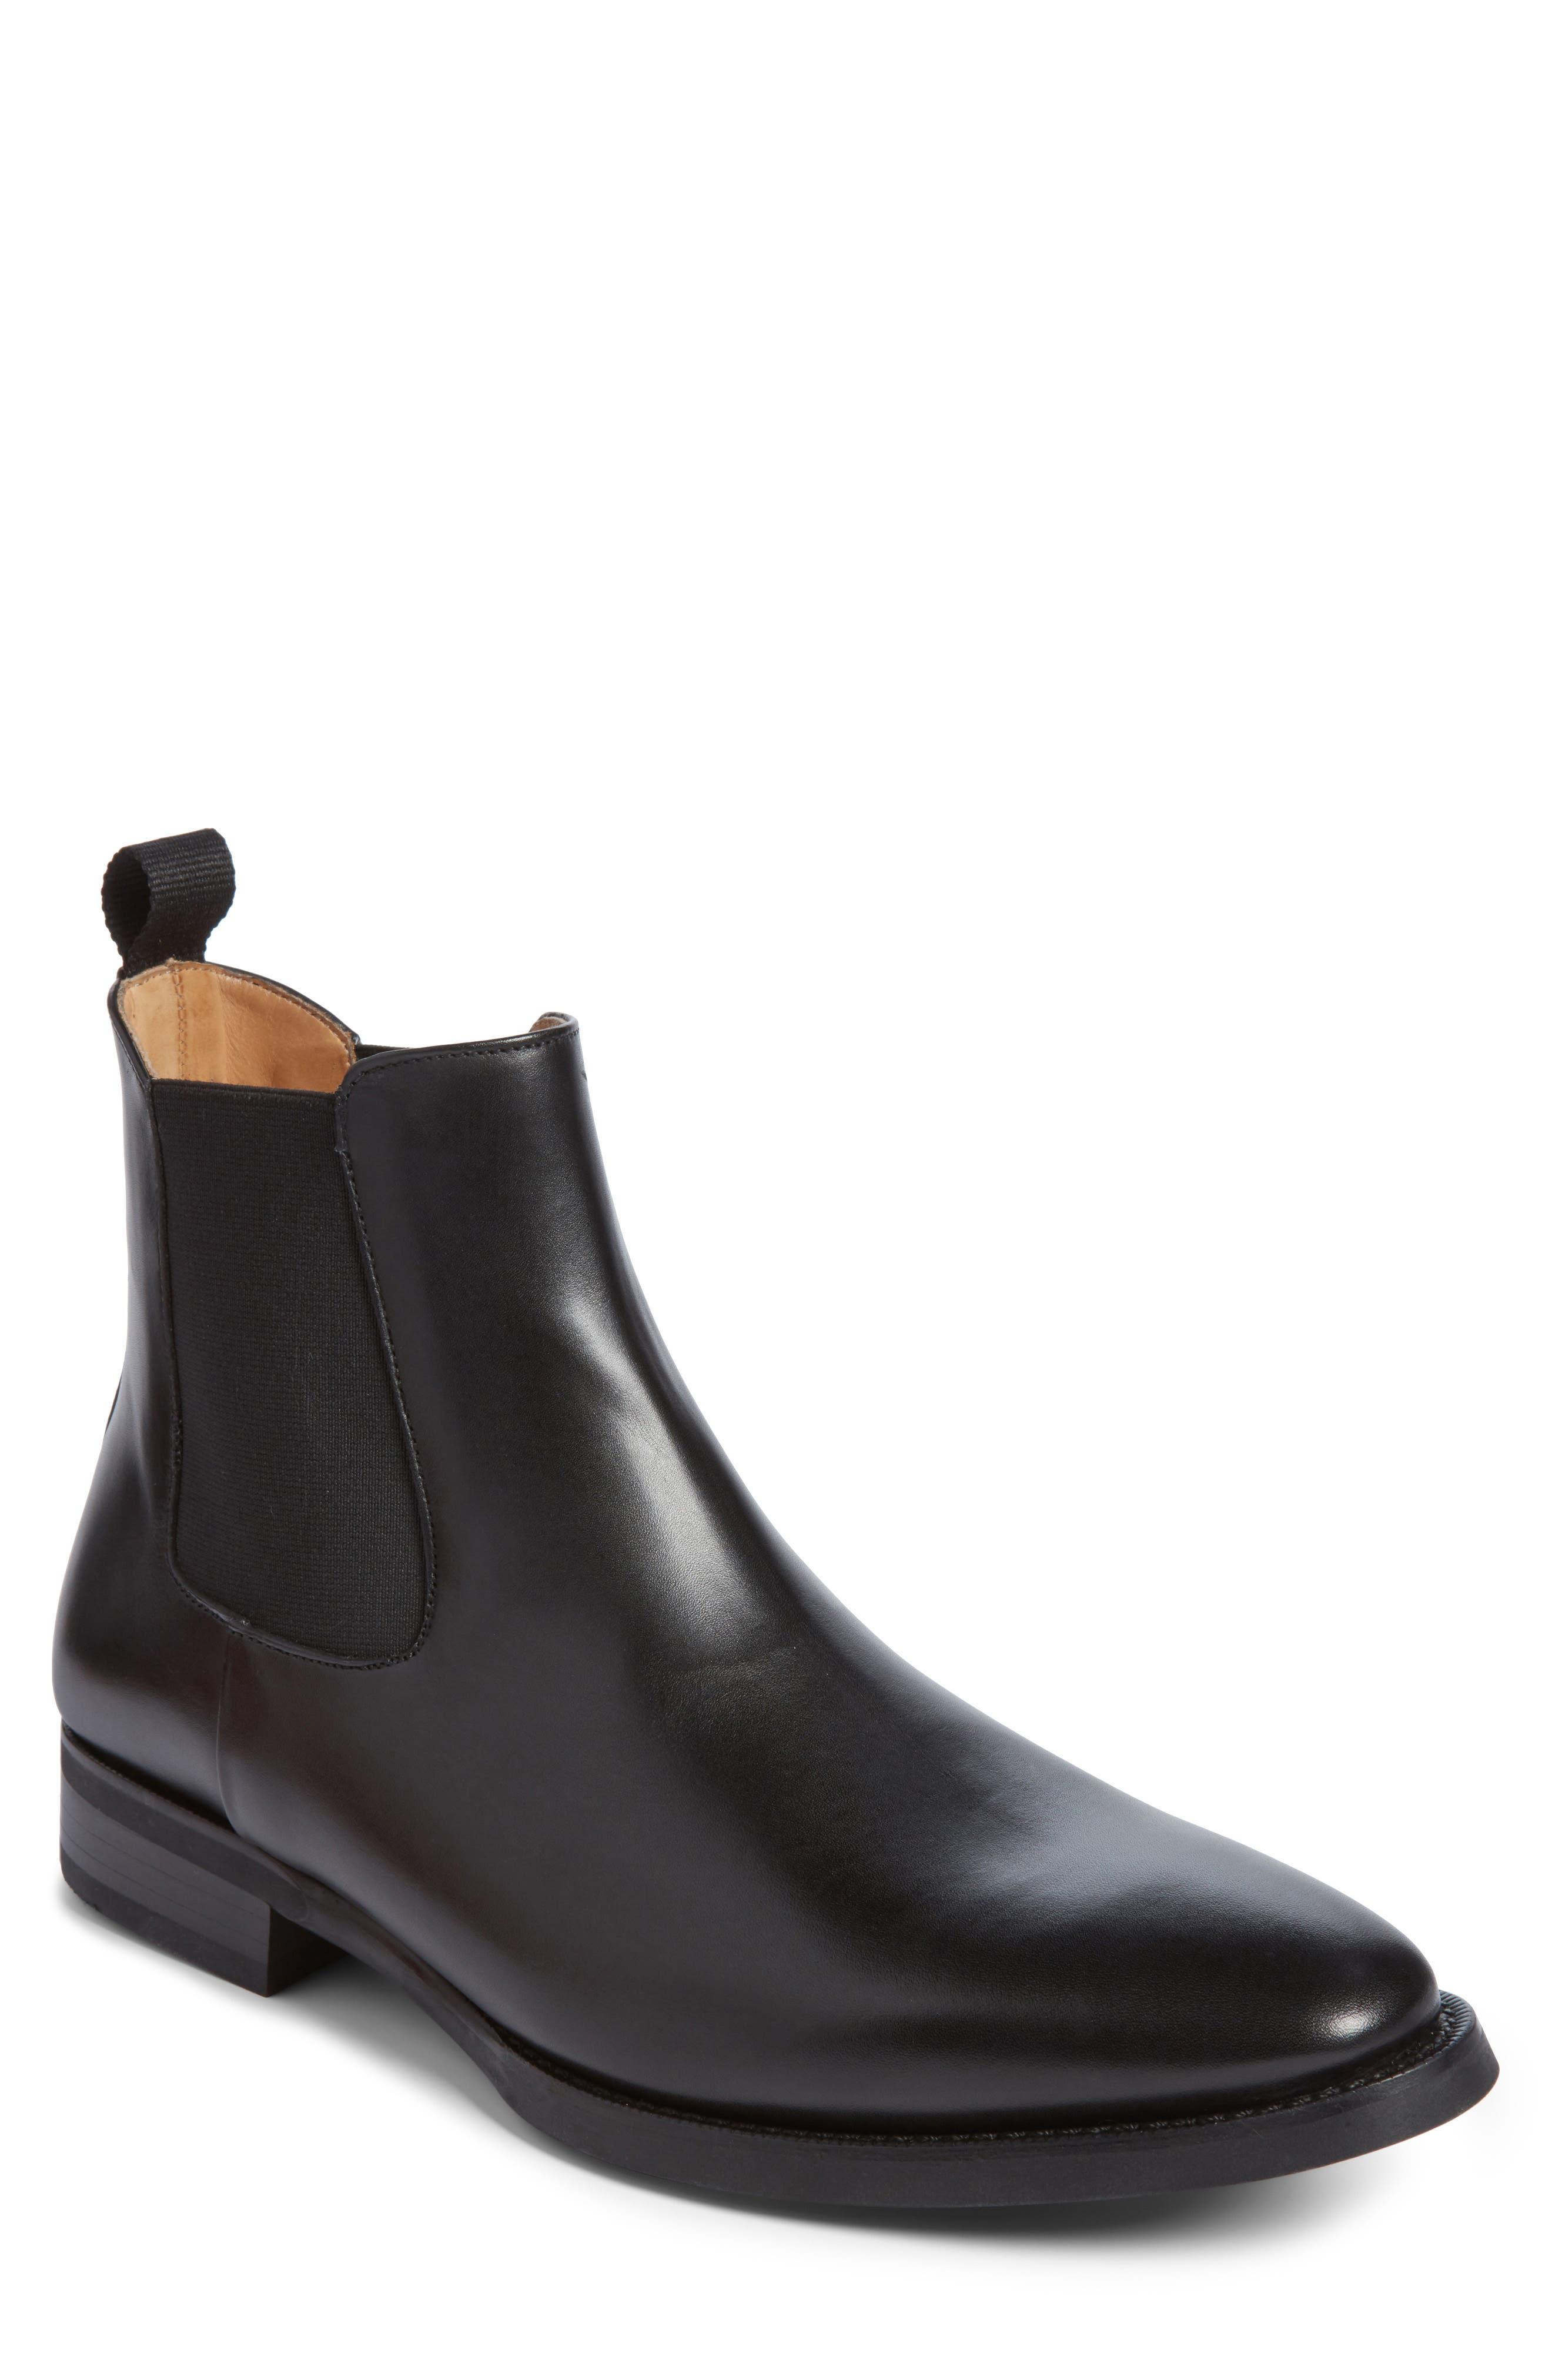 Ellis Water Resistant Chelsea Boot,                         Main,                         color, Black Leather